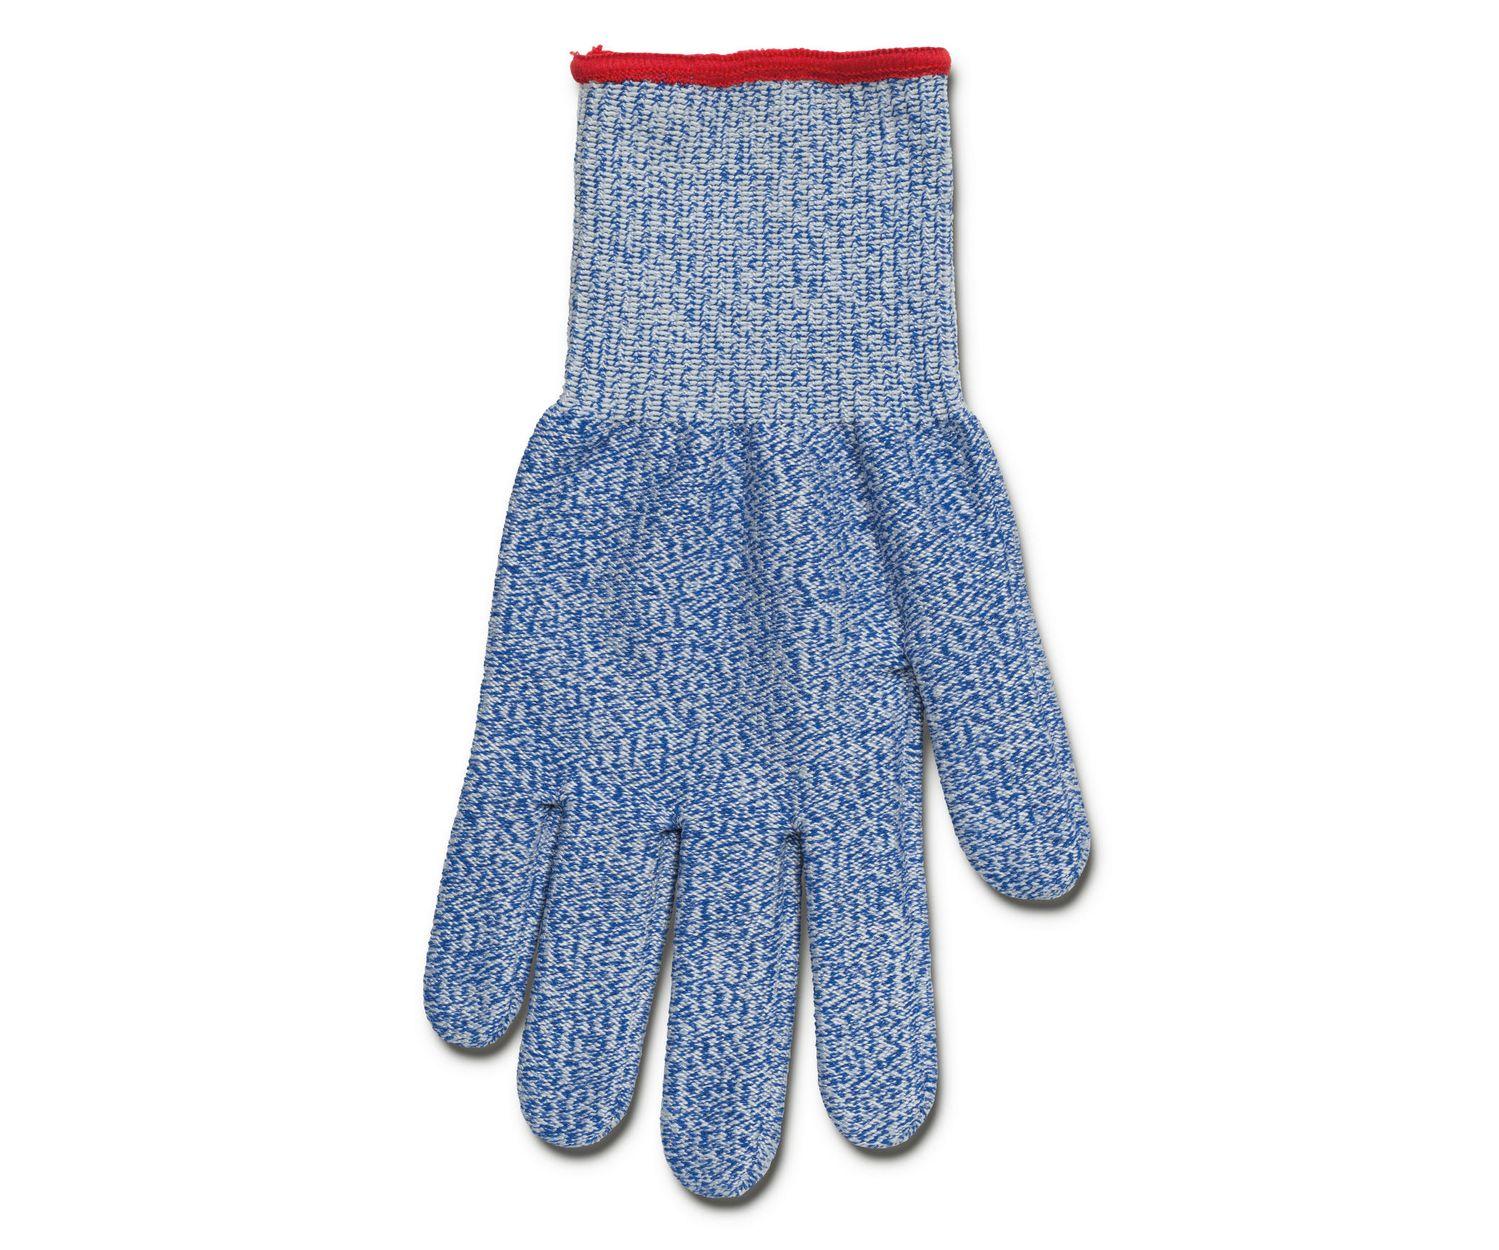 Wüsthof Schnittschutz-Handschuh, Gr. S – Bild 1